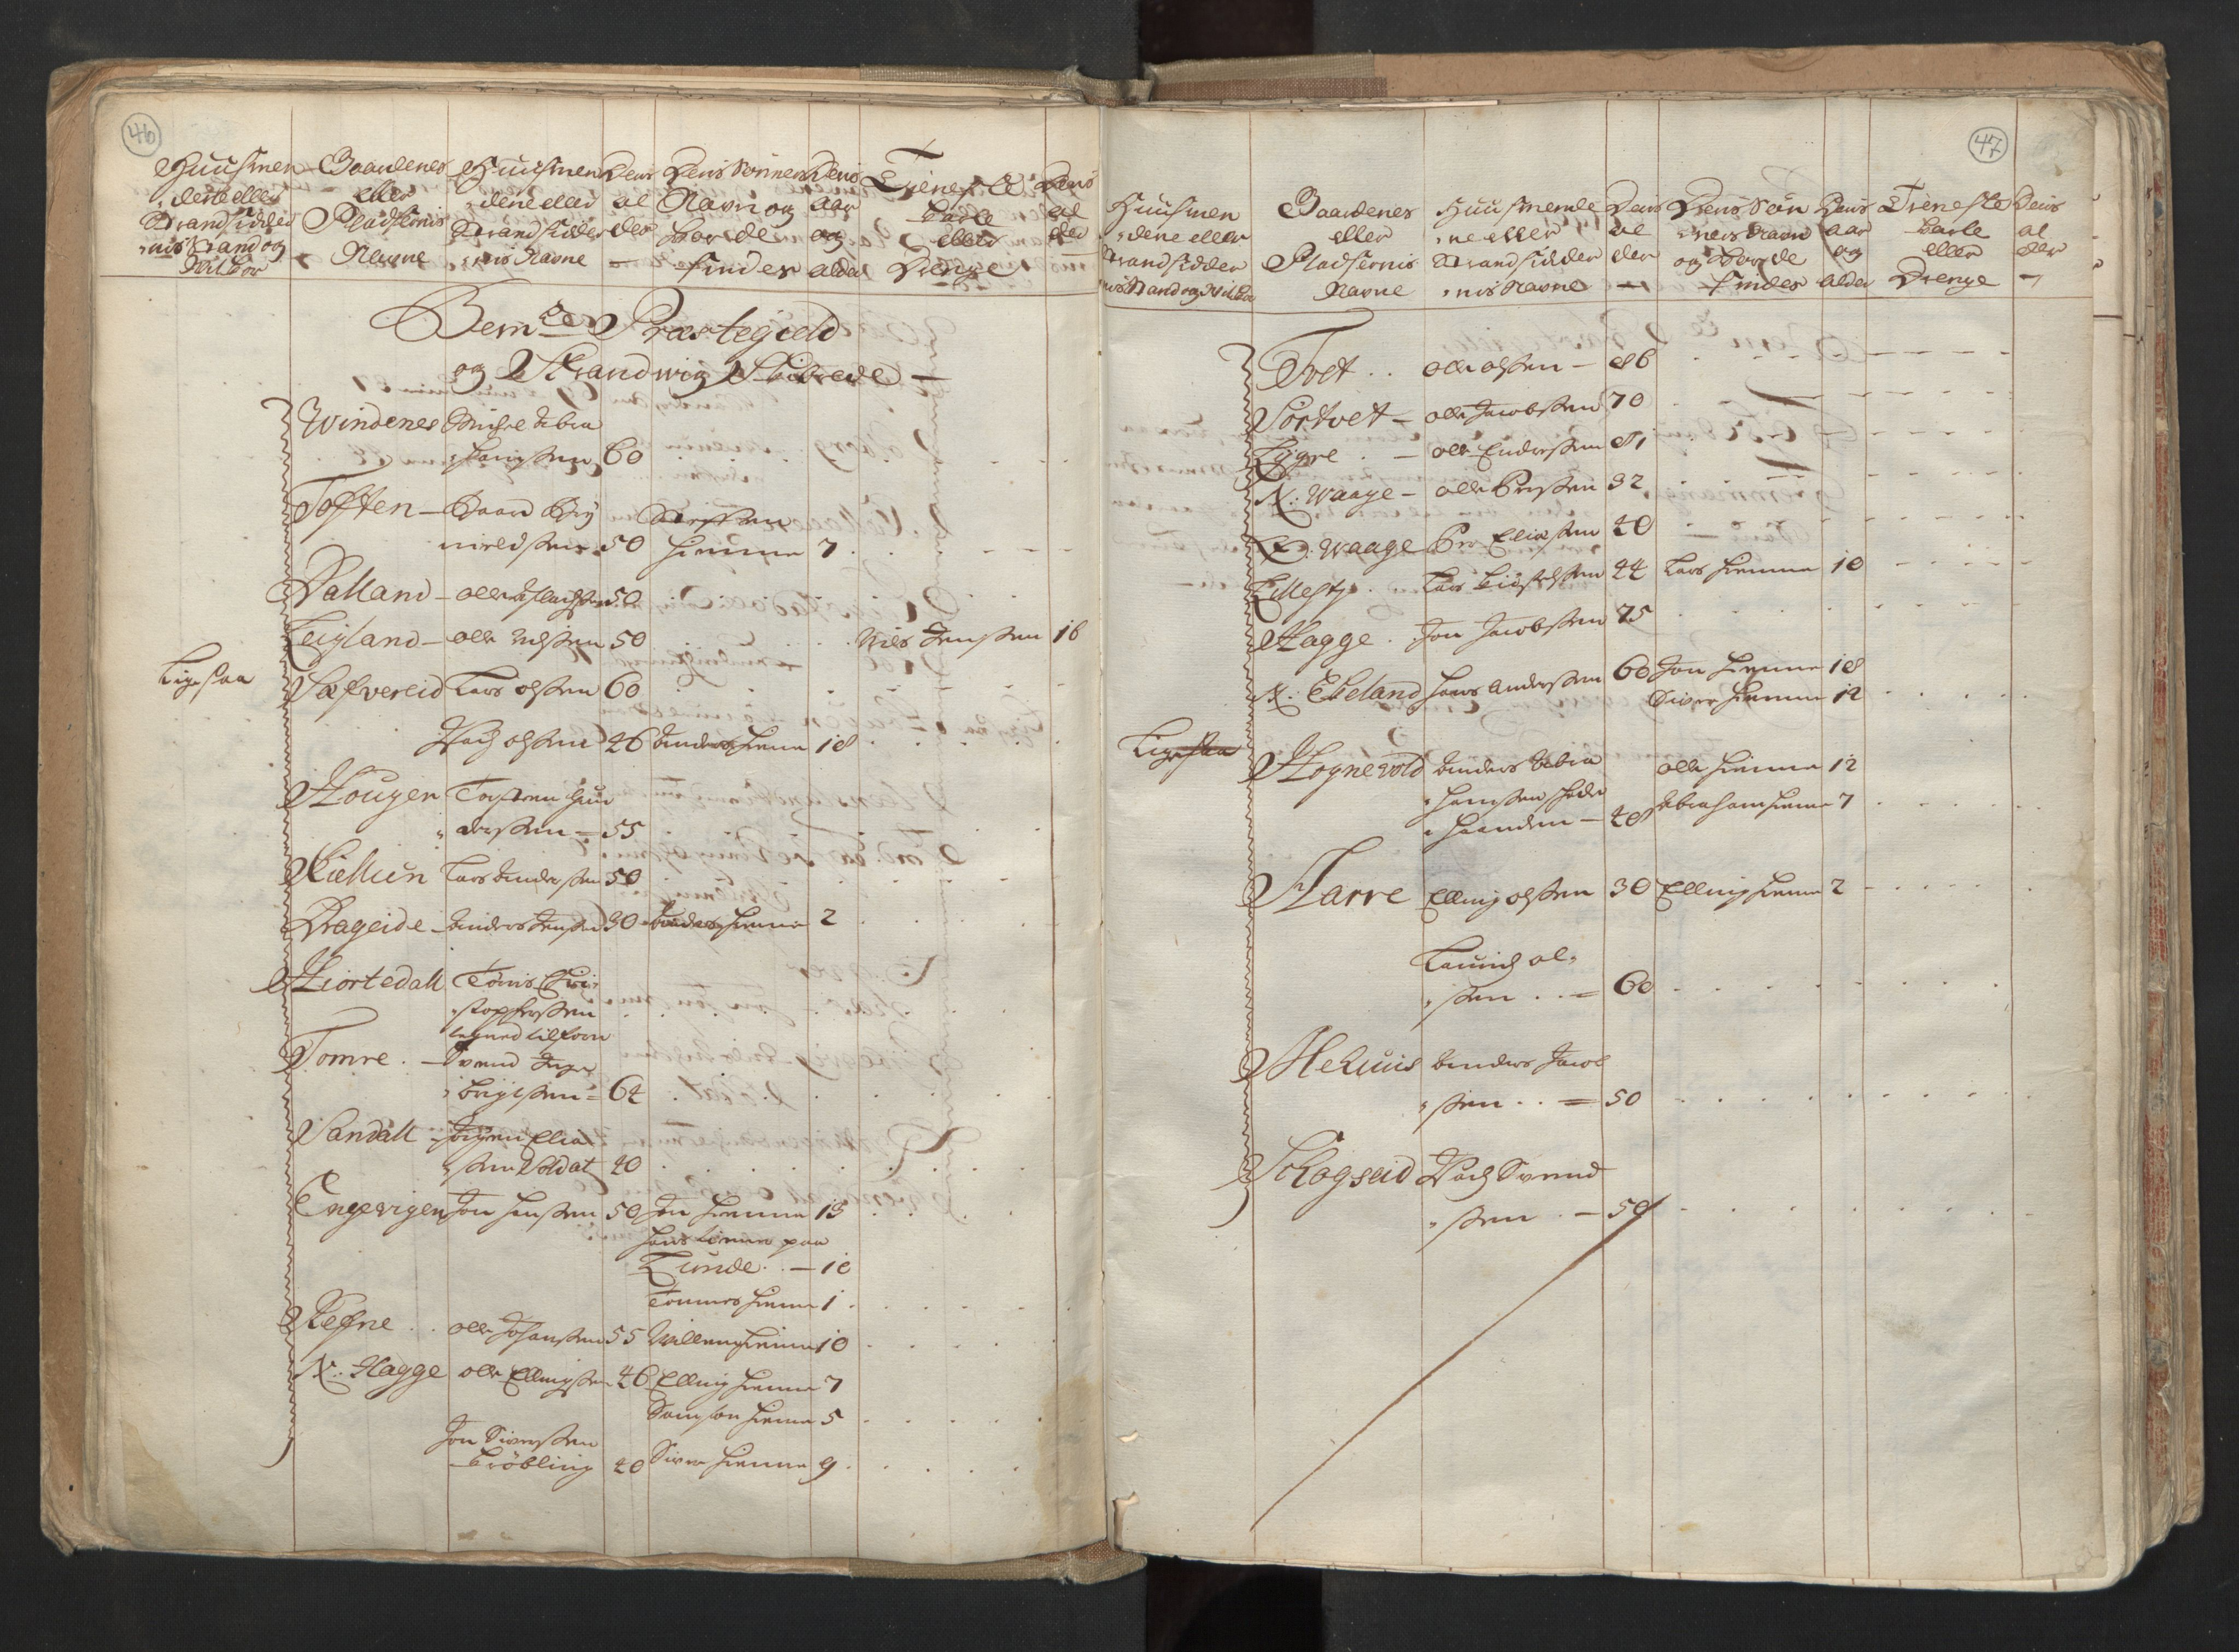 RA, Manntallet 1701, nr. 6: Sunnhordland fogderi og Hardanger fogderi, 1701, s. 46-47